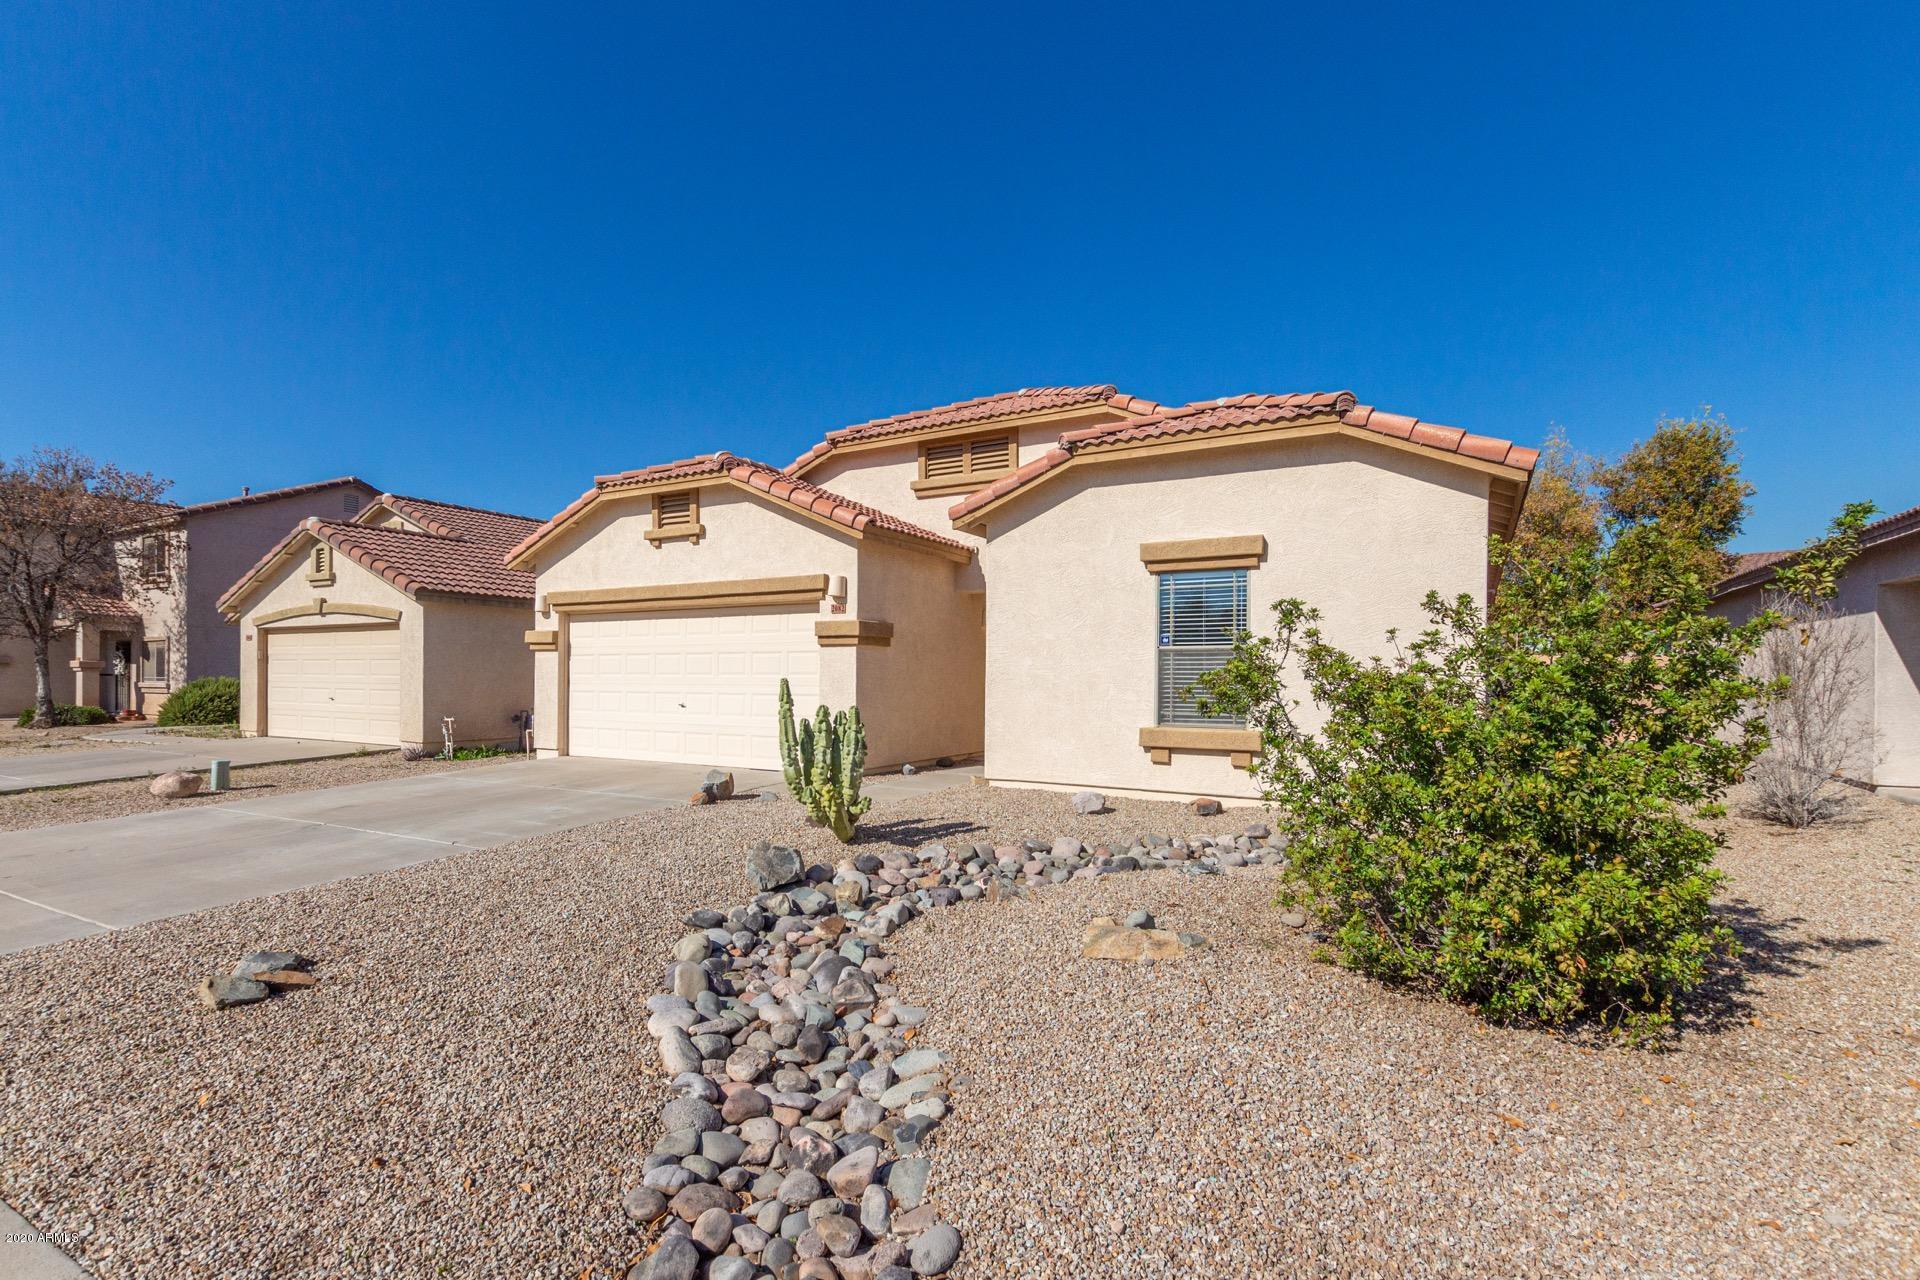 Photo of 2082 E PASO FINO Drive, San Tan Valley, AZ 85140